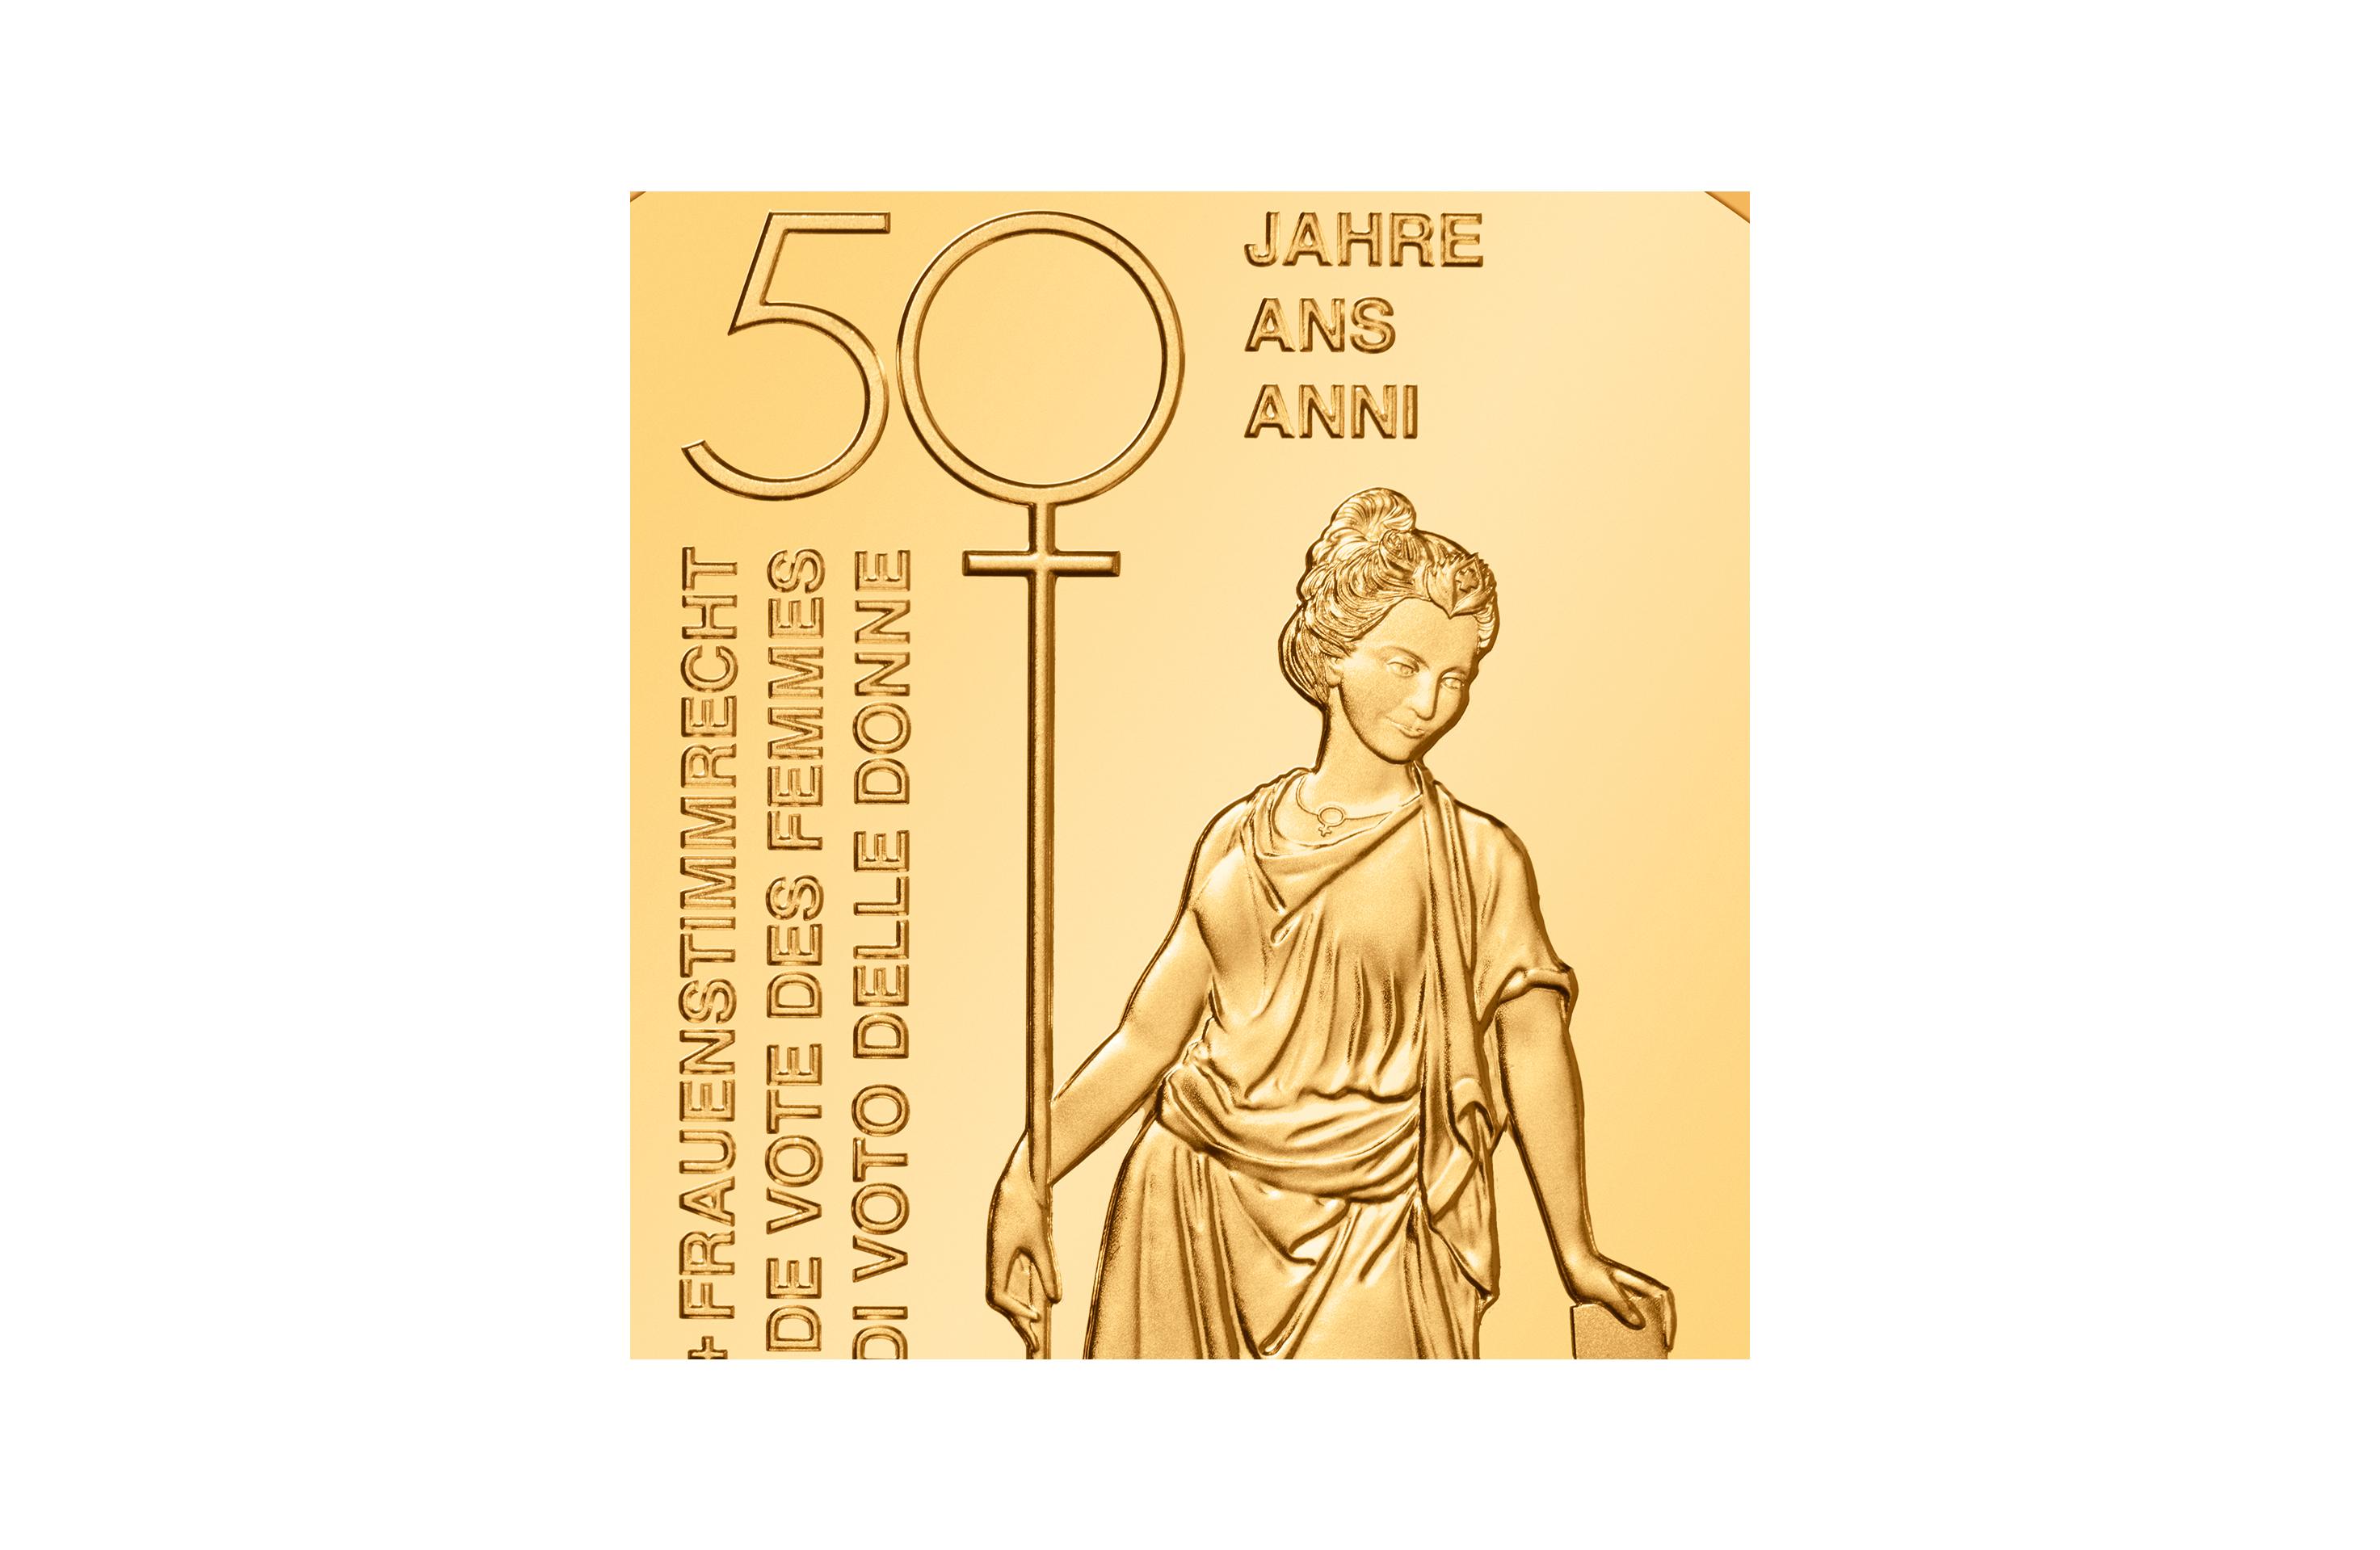 SWISS MINT: 2021 numismatic program